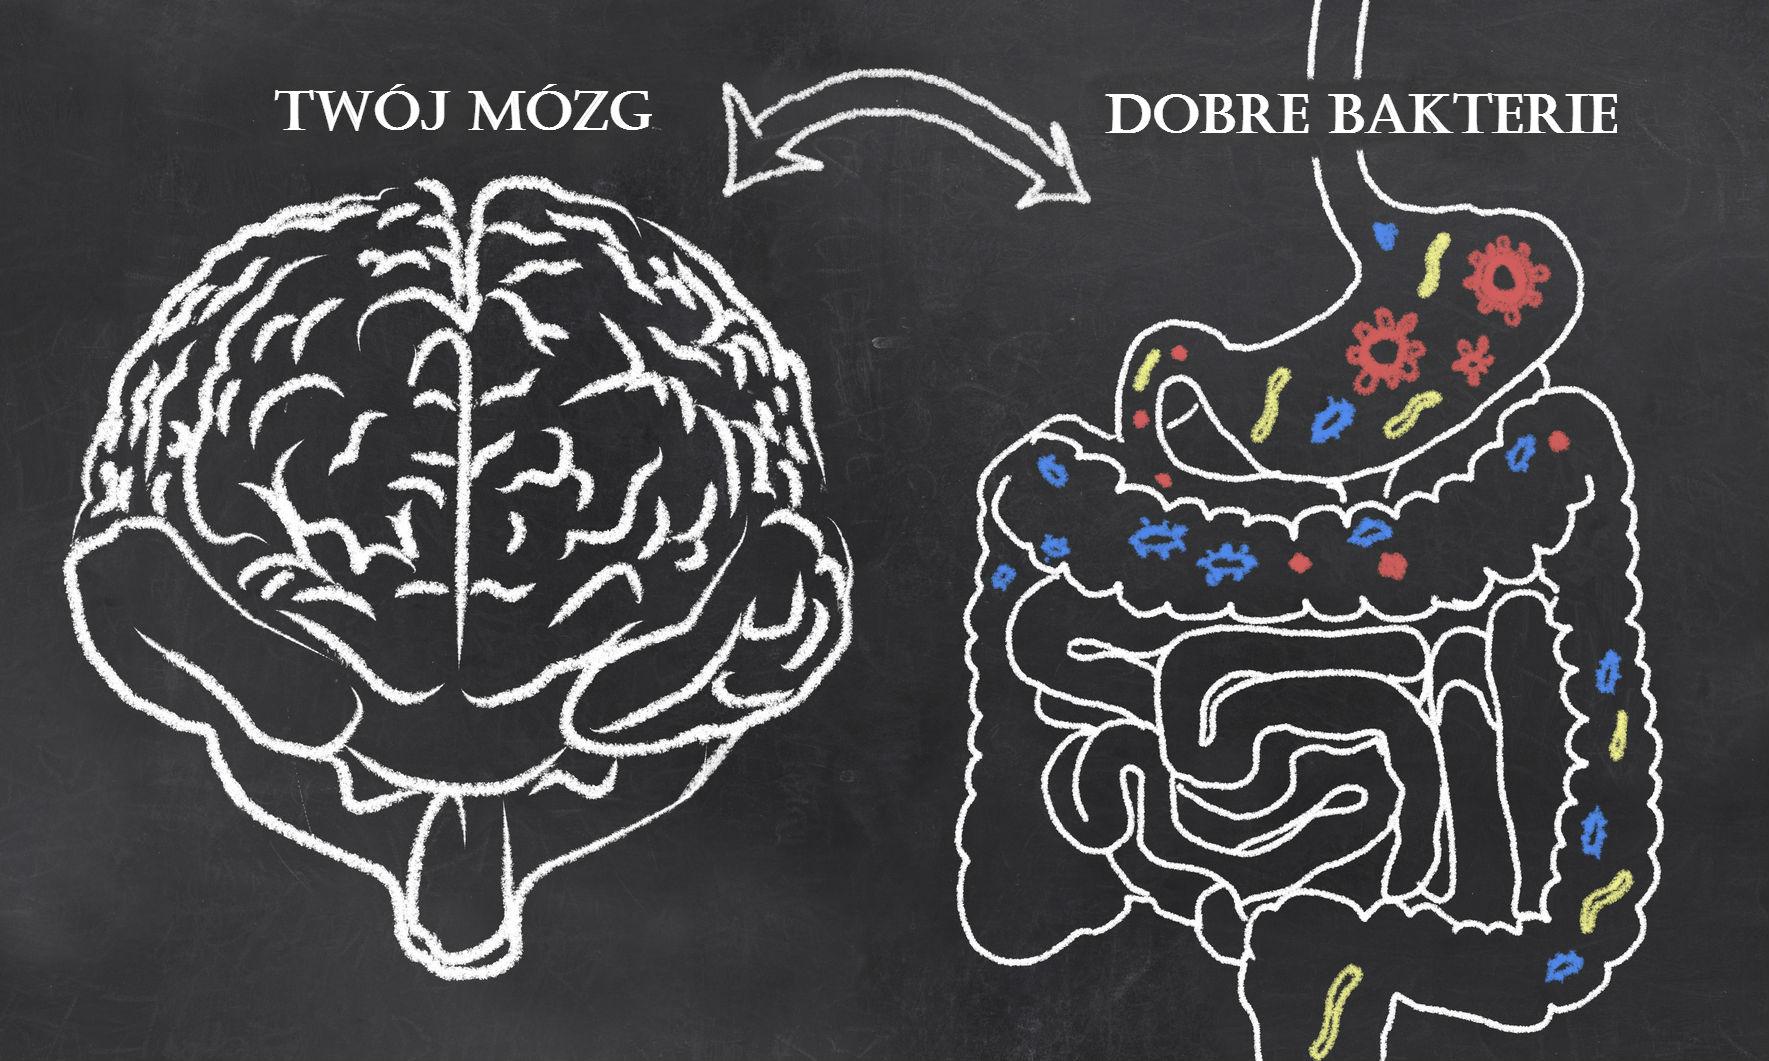 Mózg idobre bakterie